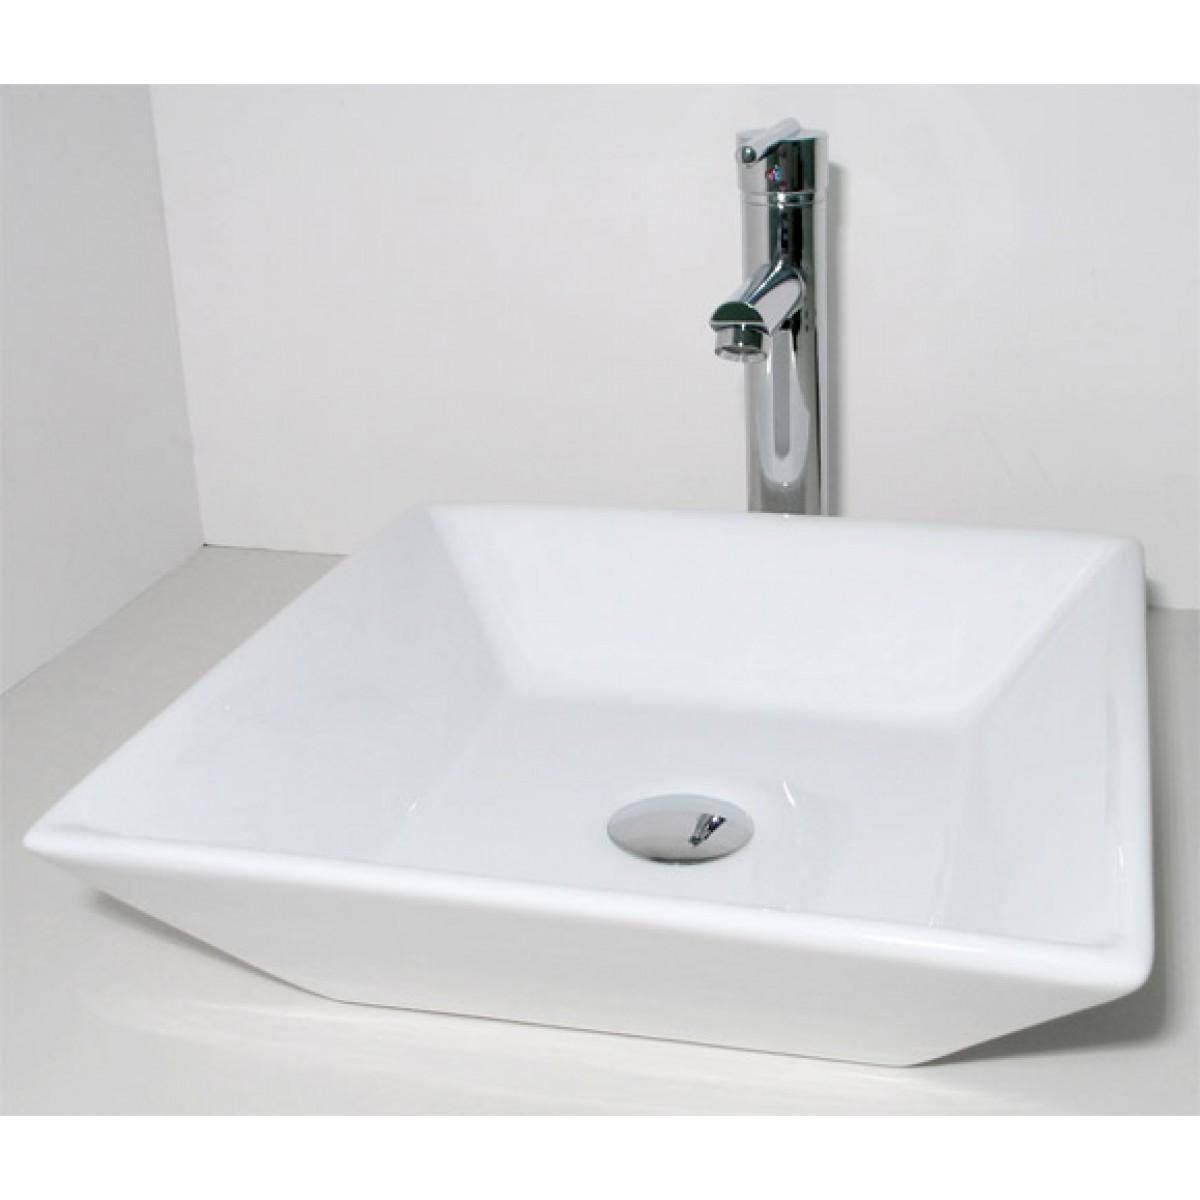 European Design Slope Wall Porcelain Ceramic Countertop Bathroom Vessel Sink 16 X 16 X 5 Inch